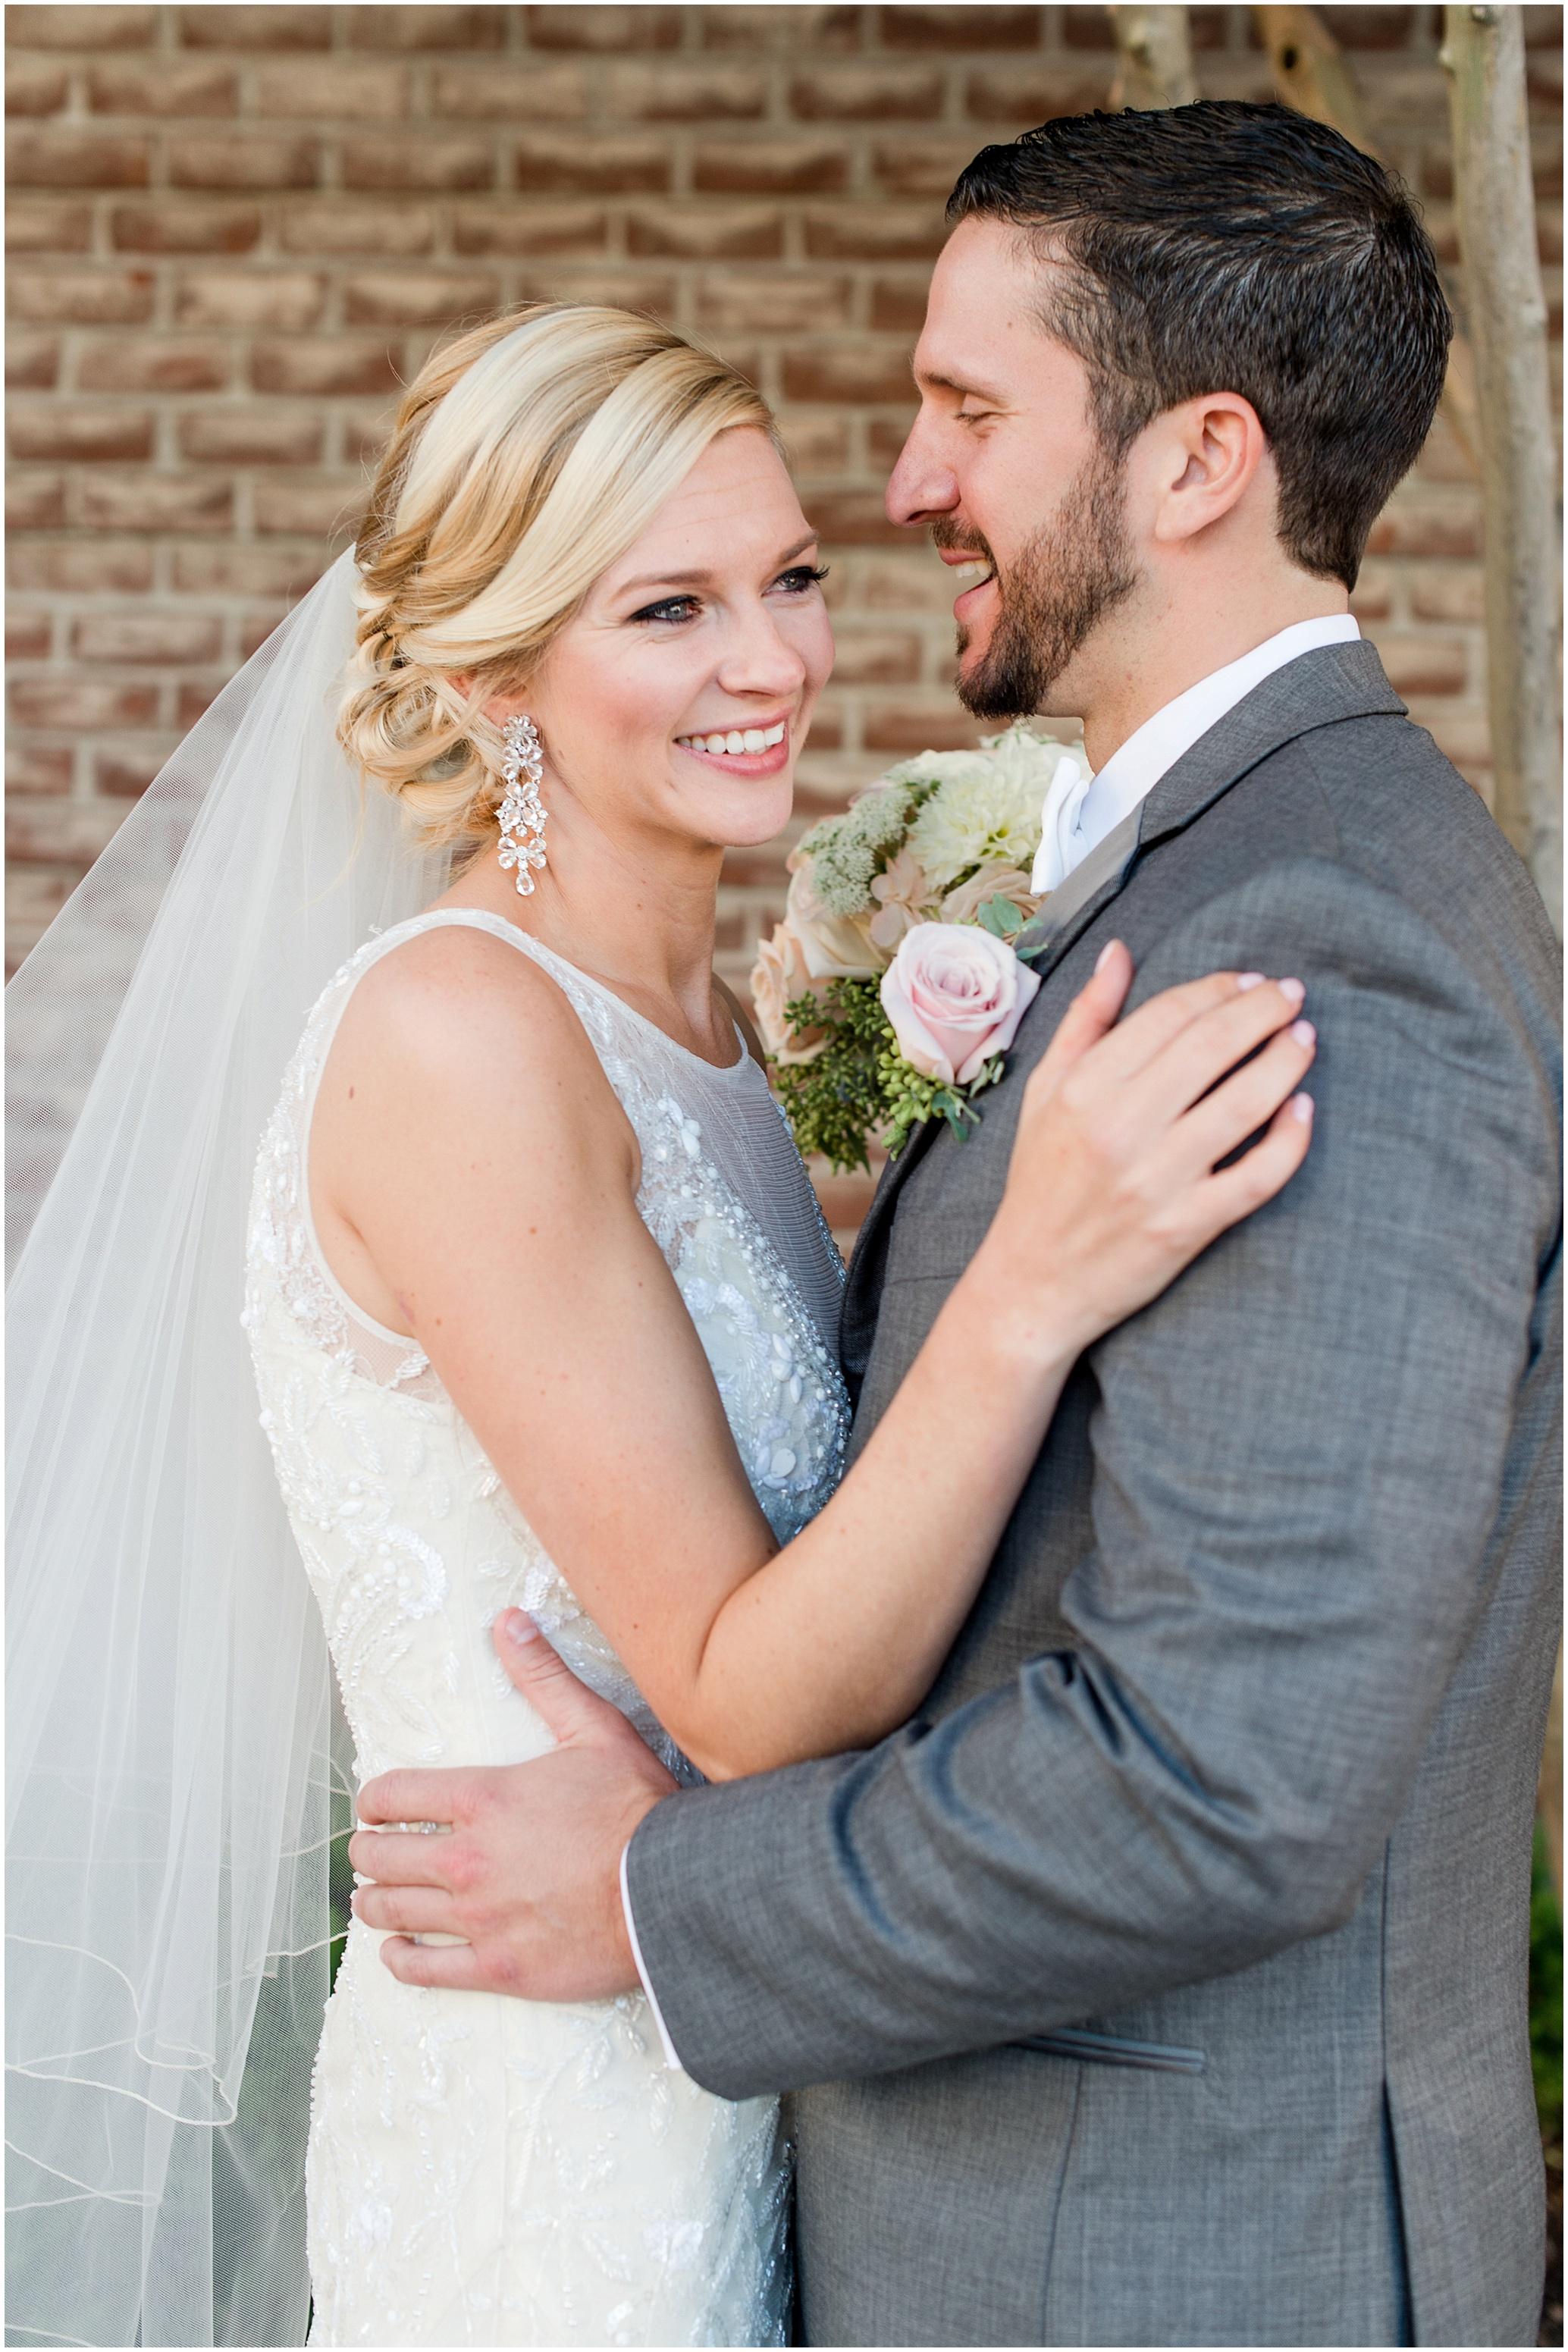 Hannah Leigh Photography Tabrizis Baltimore Wedding_2217.jpg